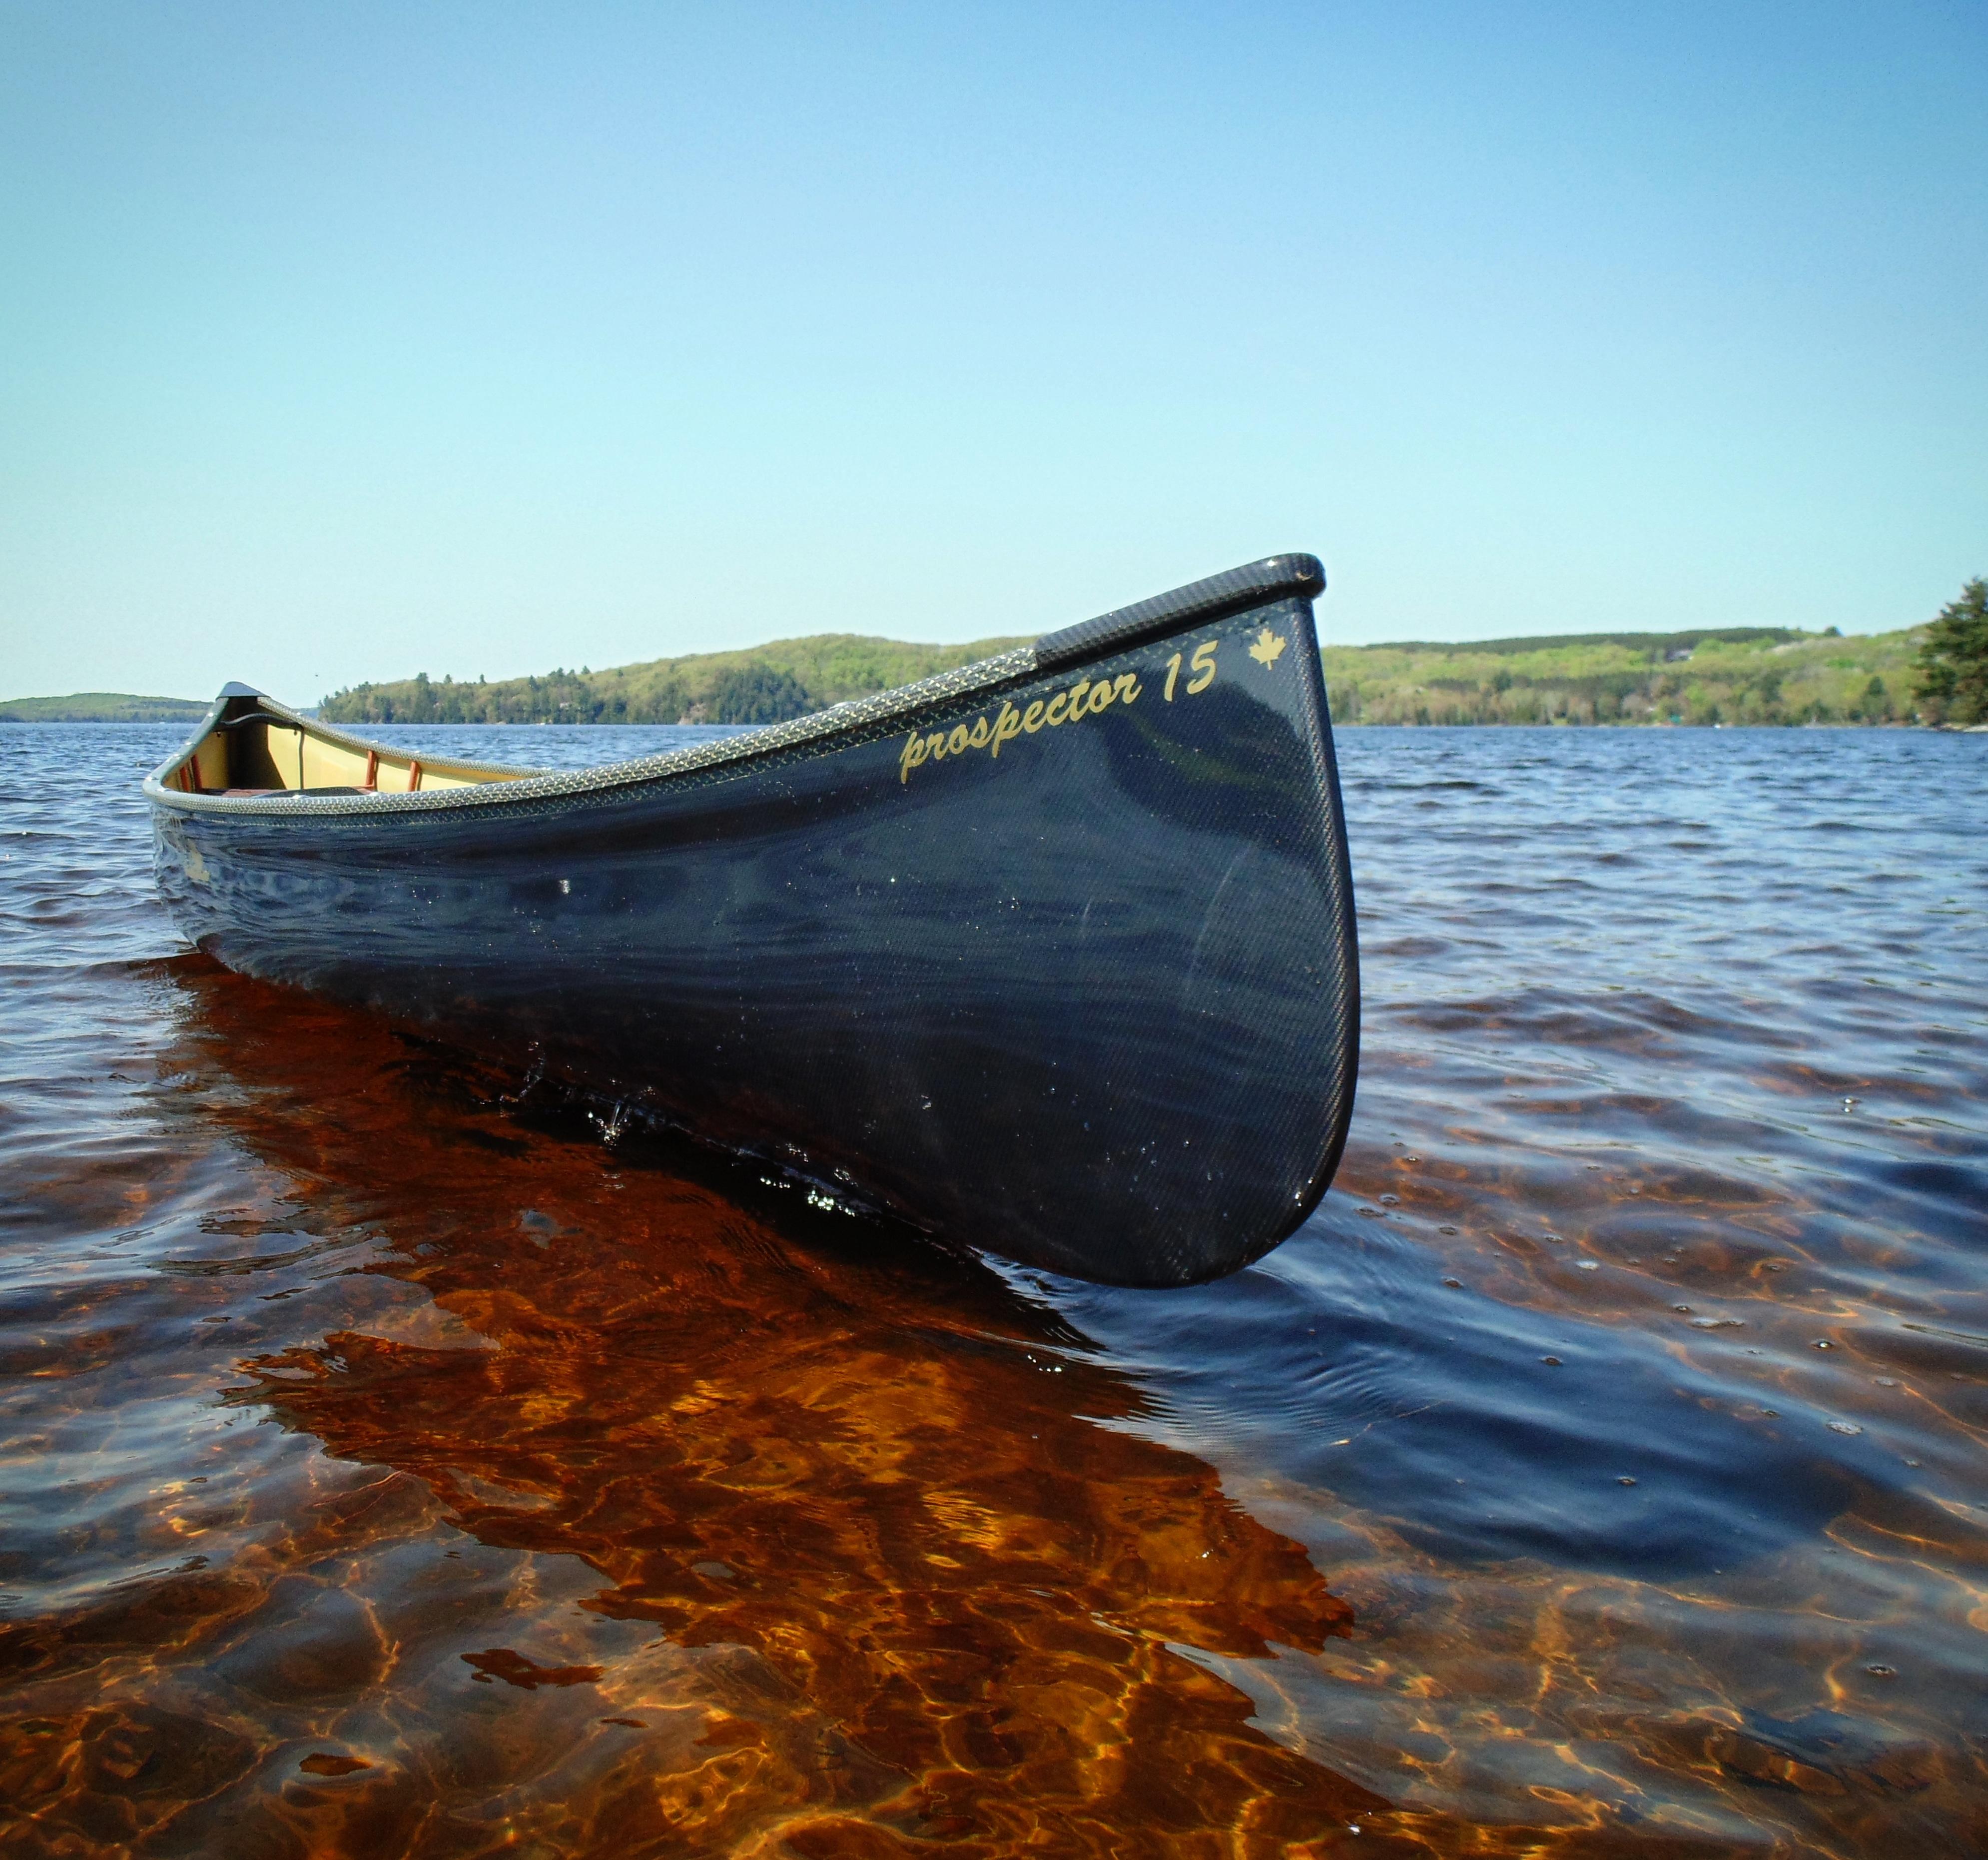 Langford Canoe Prospector 15 39 lbs aabbccdd222